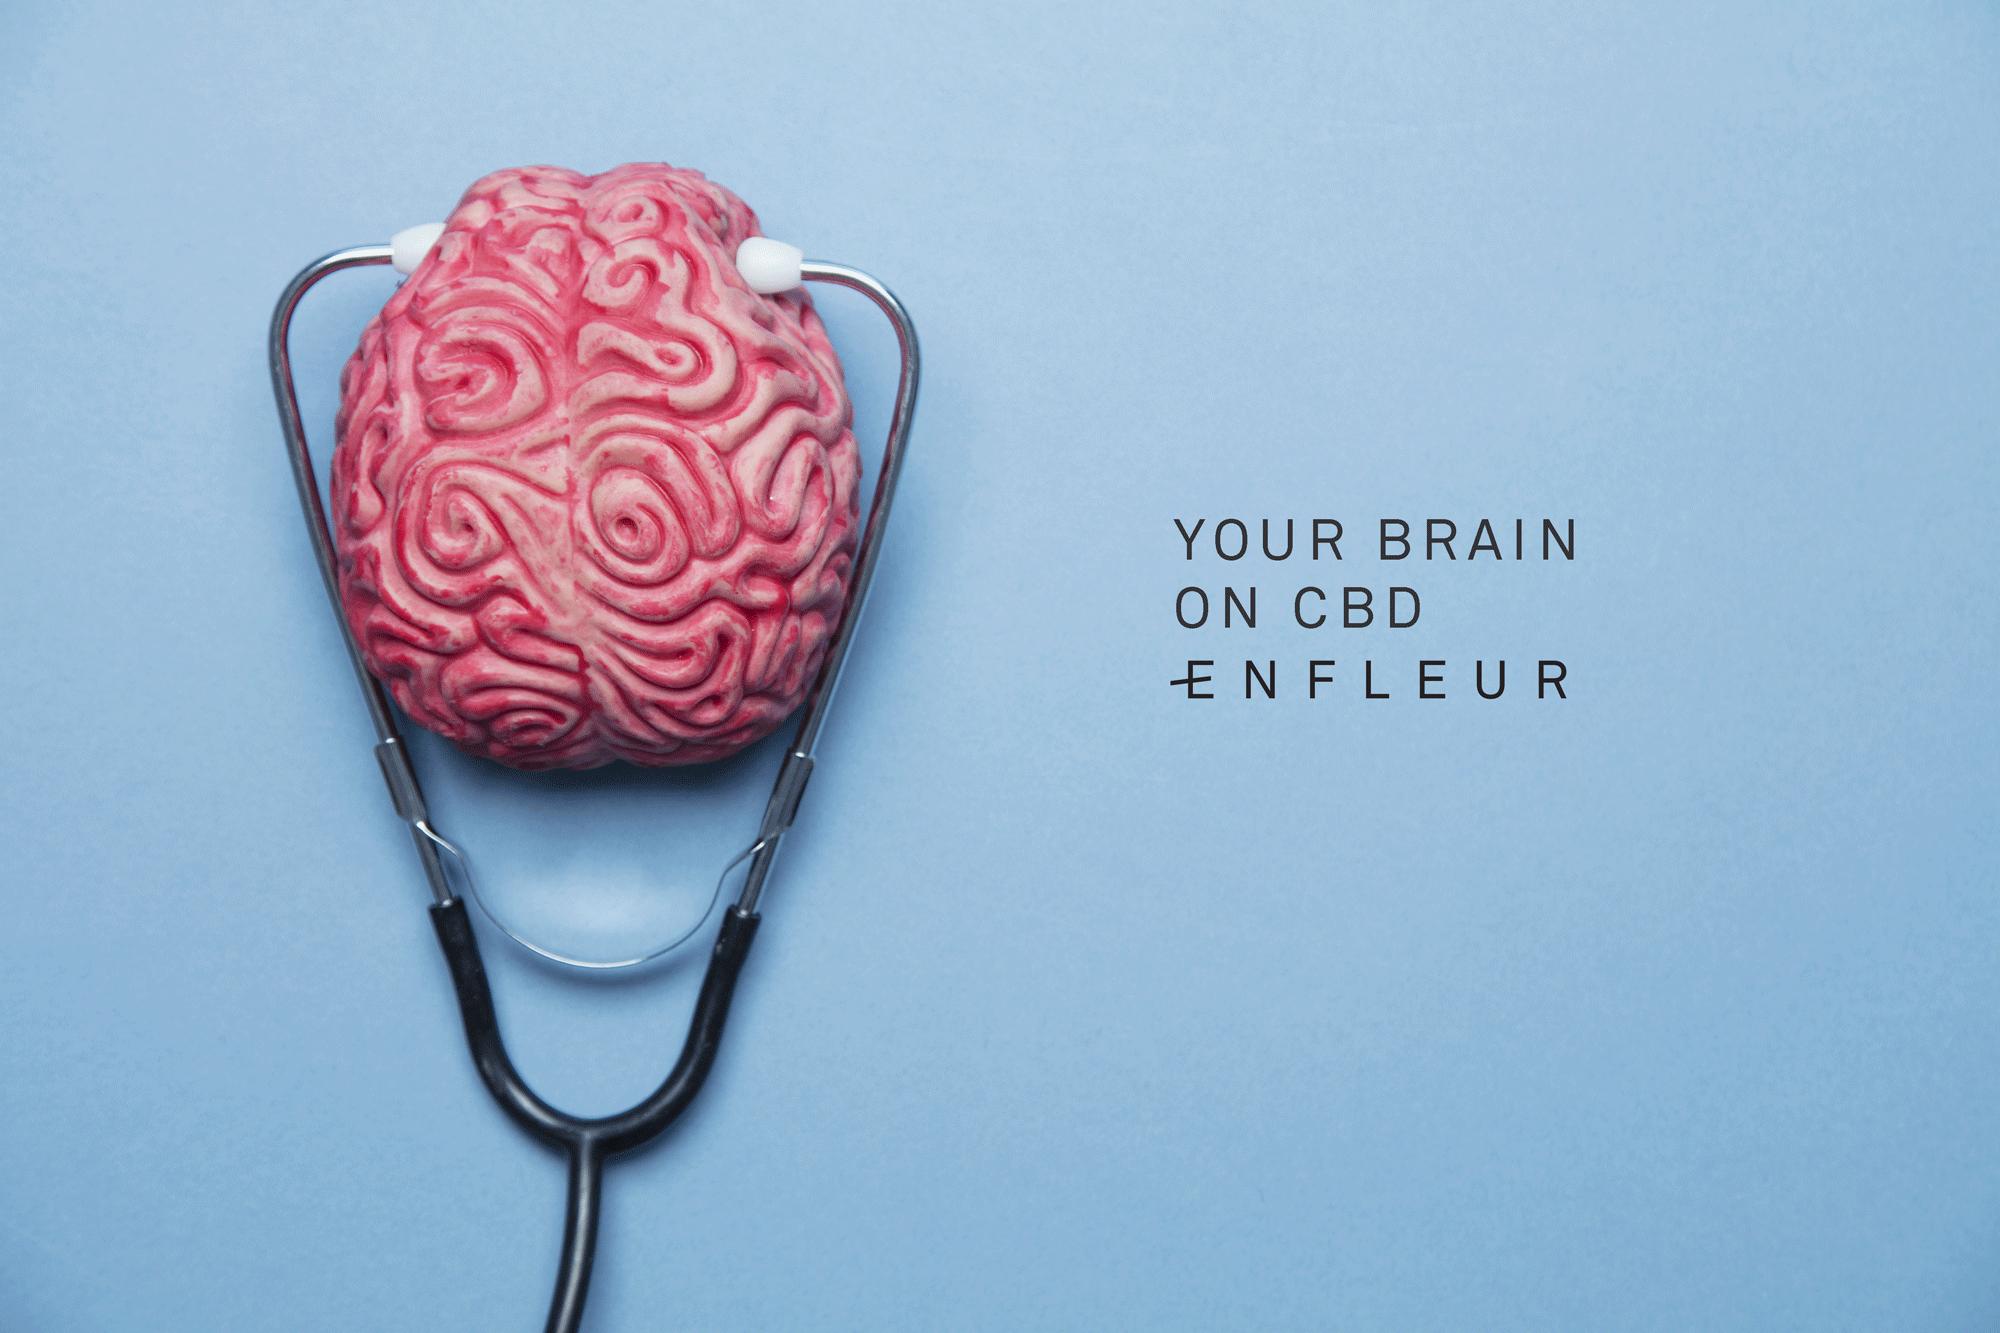 enfleur-blog-brain-psychosis-cbd.png